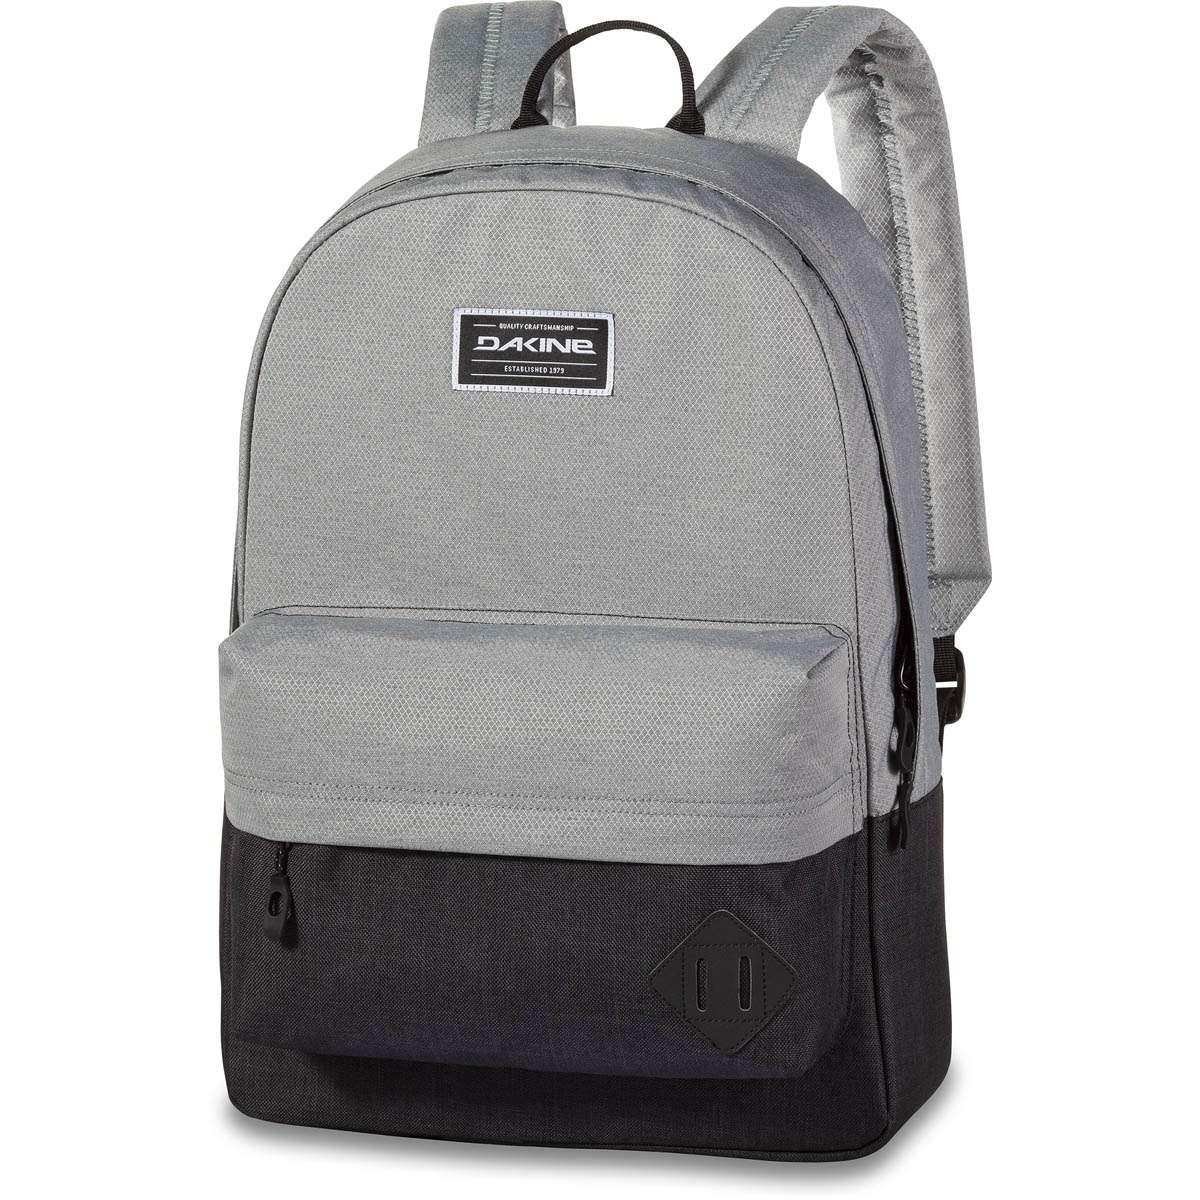 095e6789db Dakine 365 Pack 21L Backpack Laurelwood